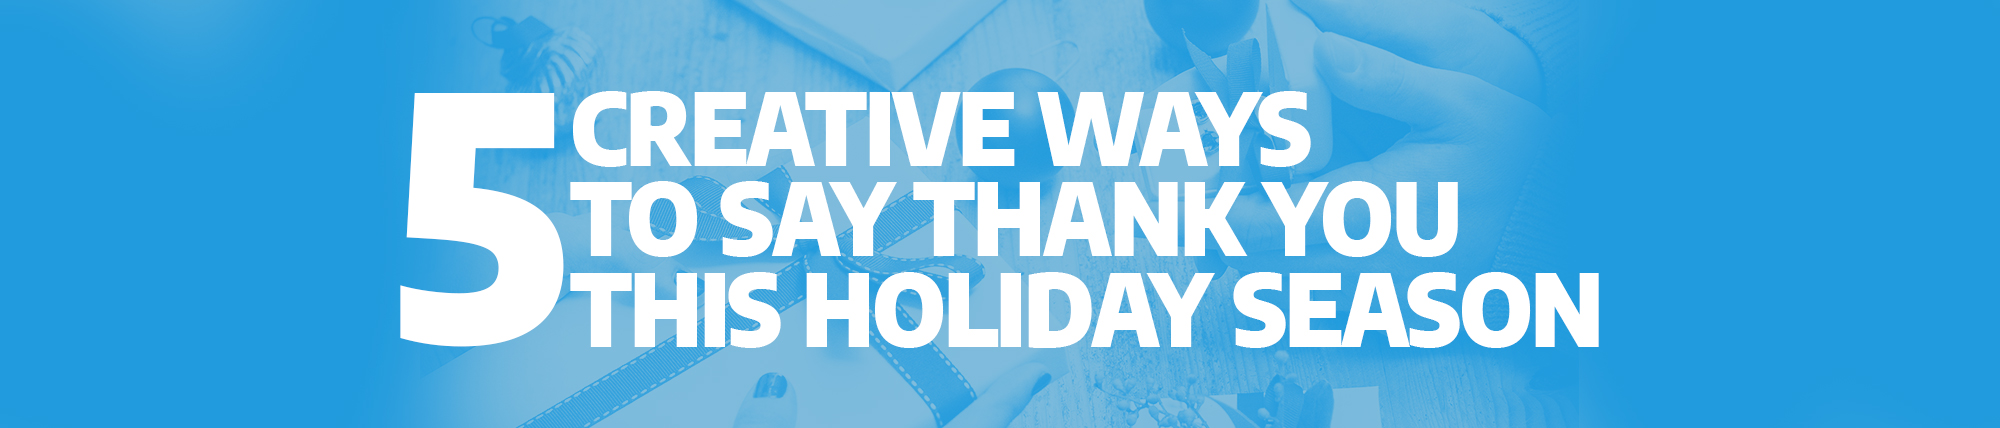 5 Creative Ways to Say Thank You This Holiday Season